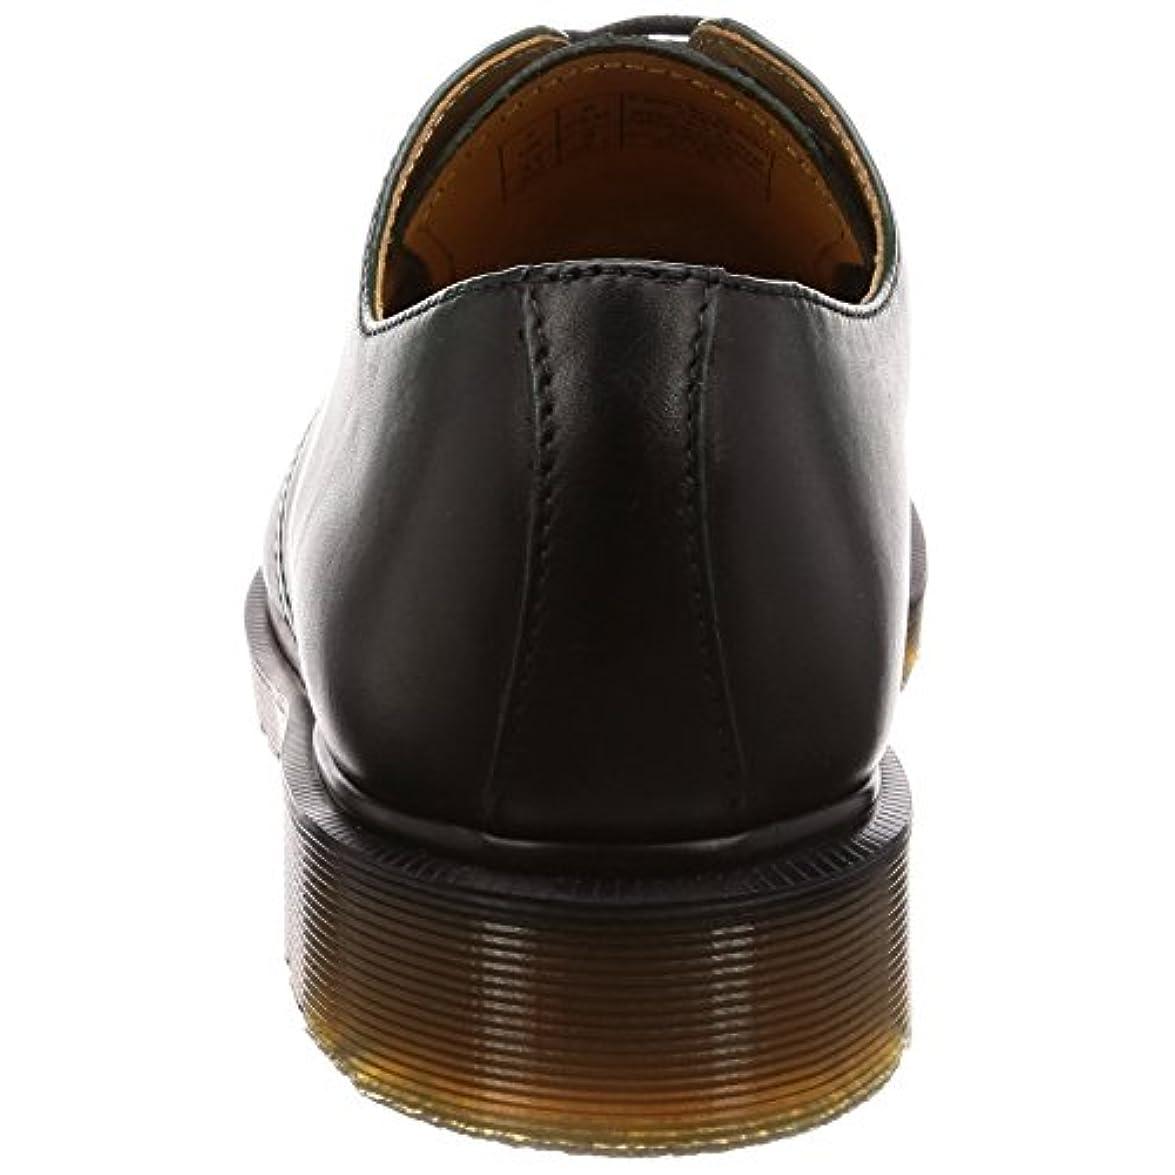 Dr Martens Unisex 1461 Antique Temperley Leather Scarpe